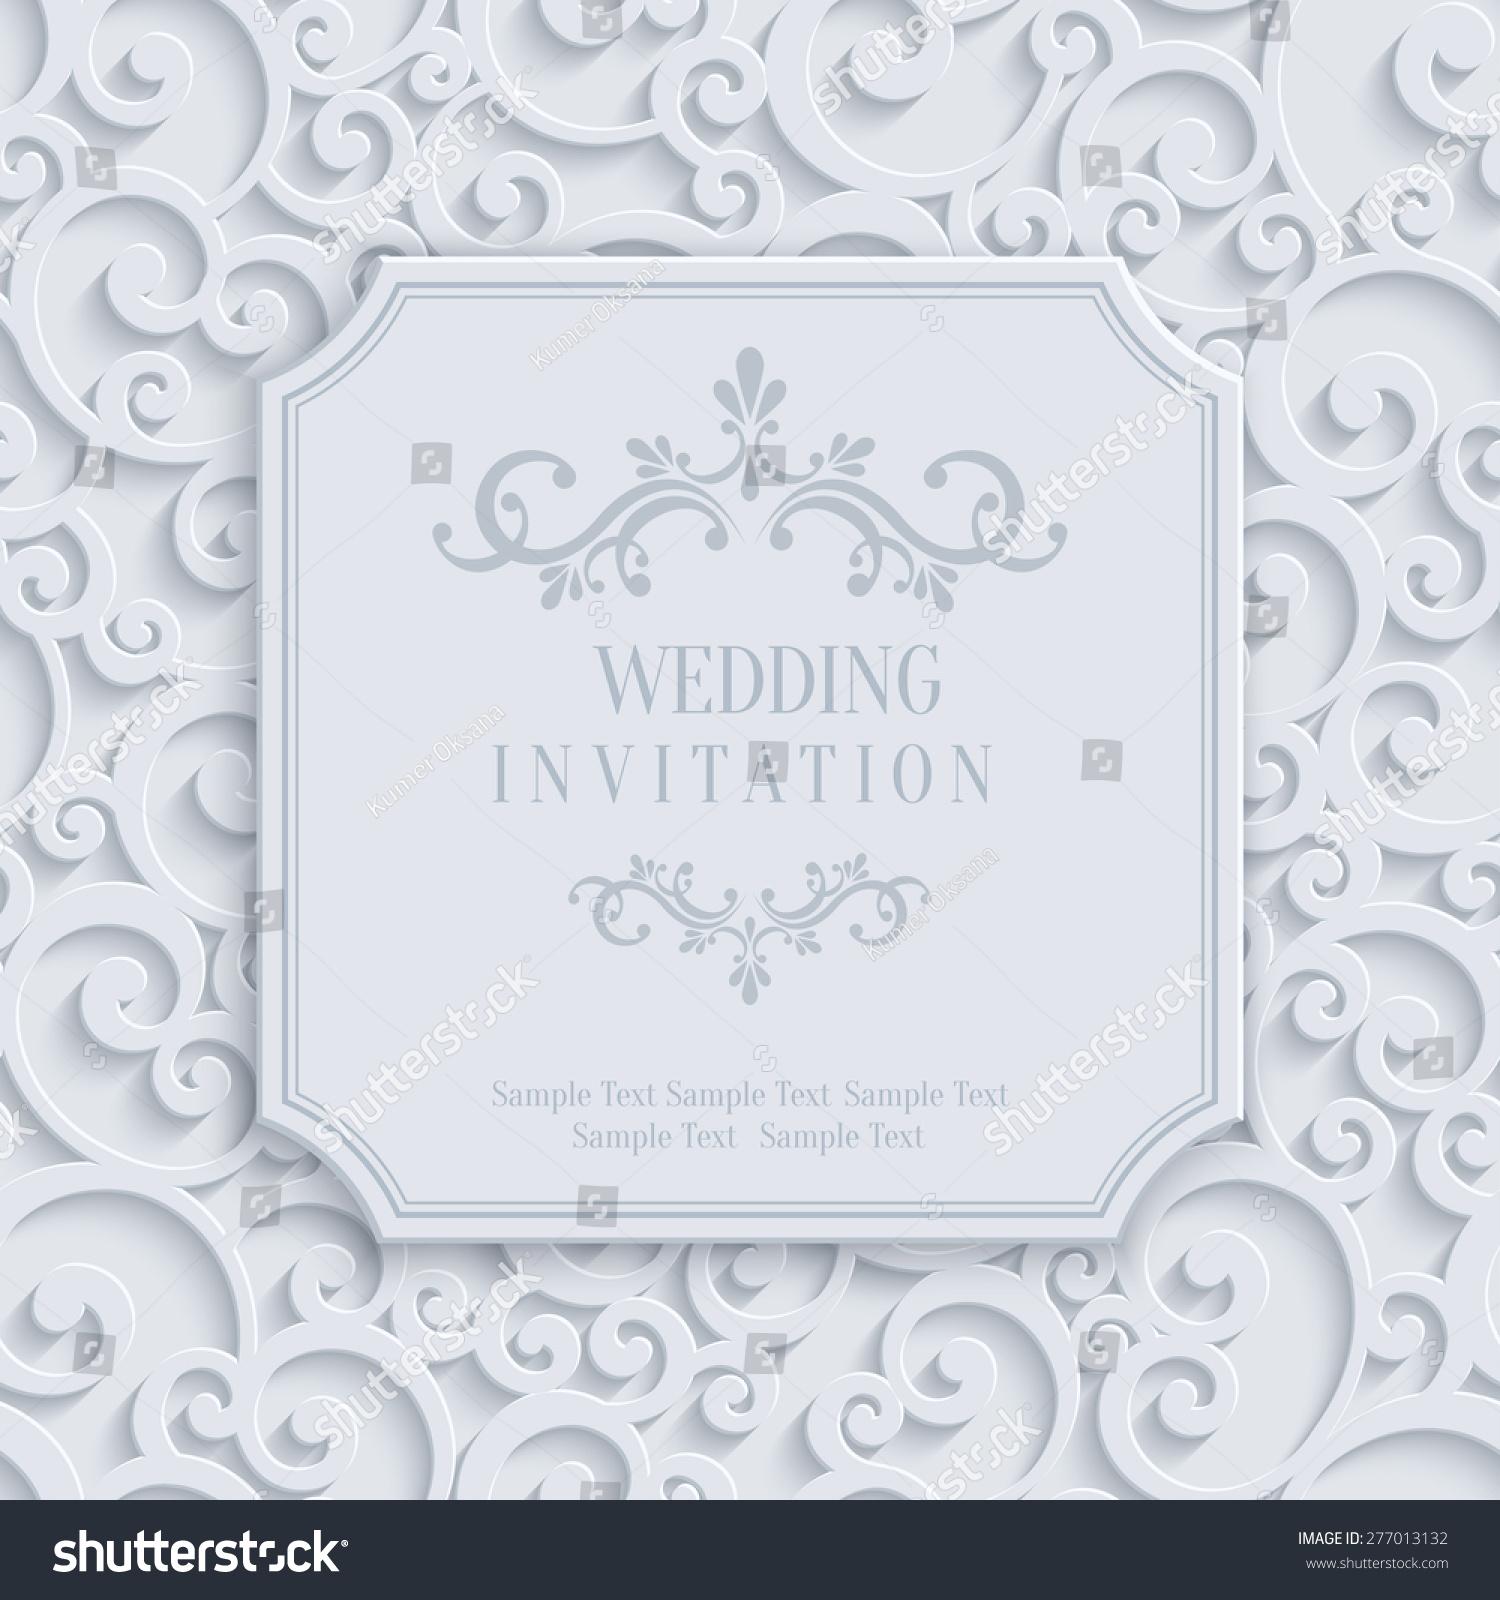 Vector 3d curl wedding invitation greeting stock vector 277013132 vector 3d curl wedding invitation greeting stock vector 277013132 shutterstock stopboris Choice Image